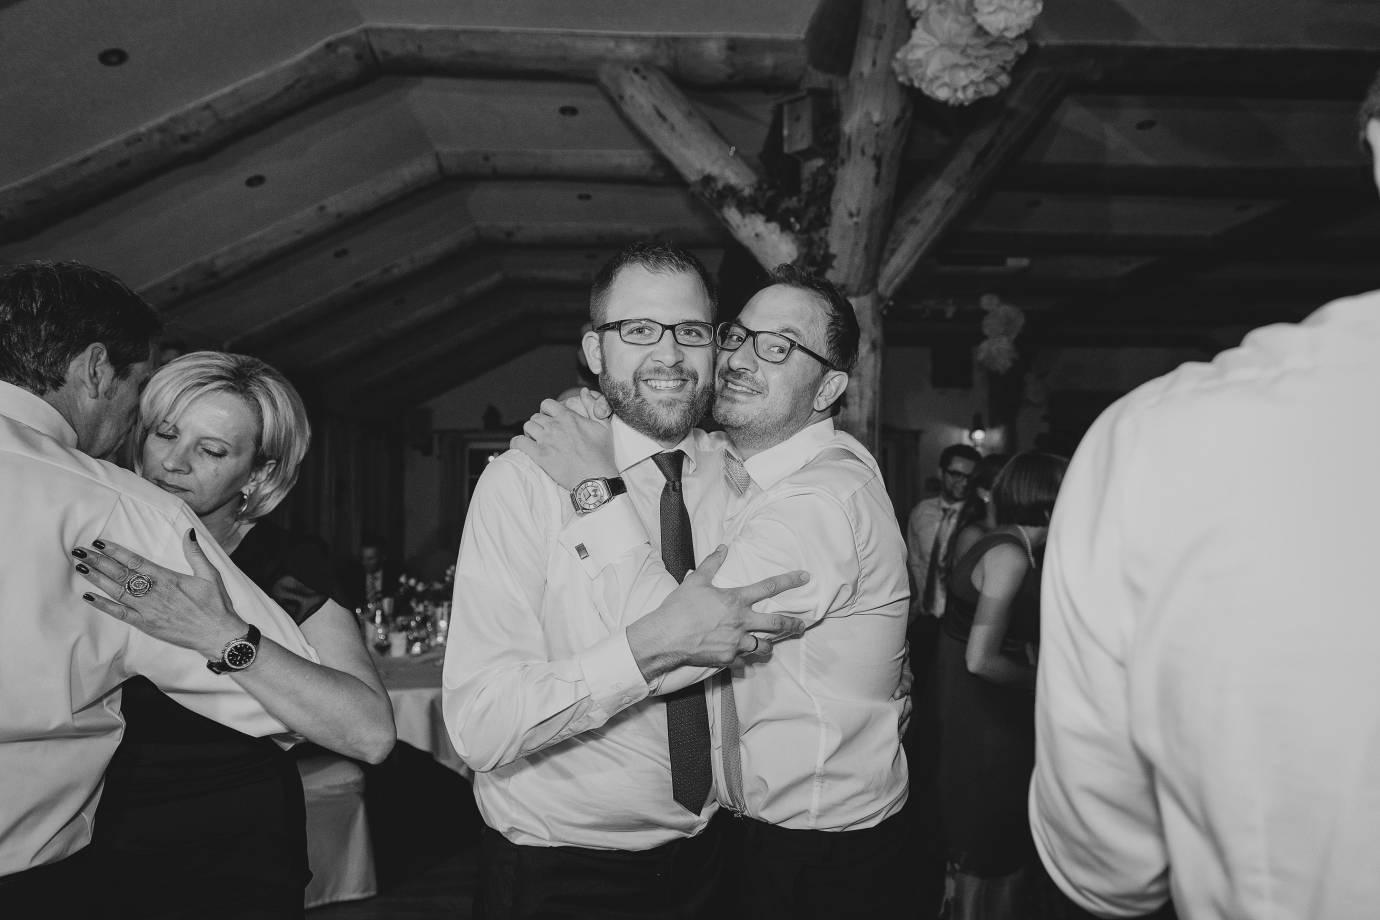 hochzeitsfotograf ganderkesee 233 - Christina+Andreas